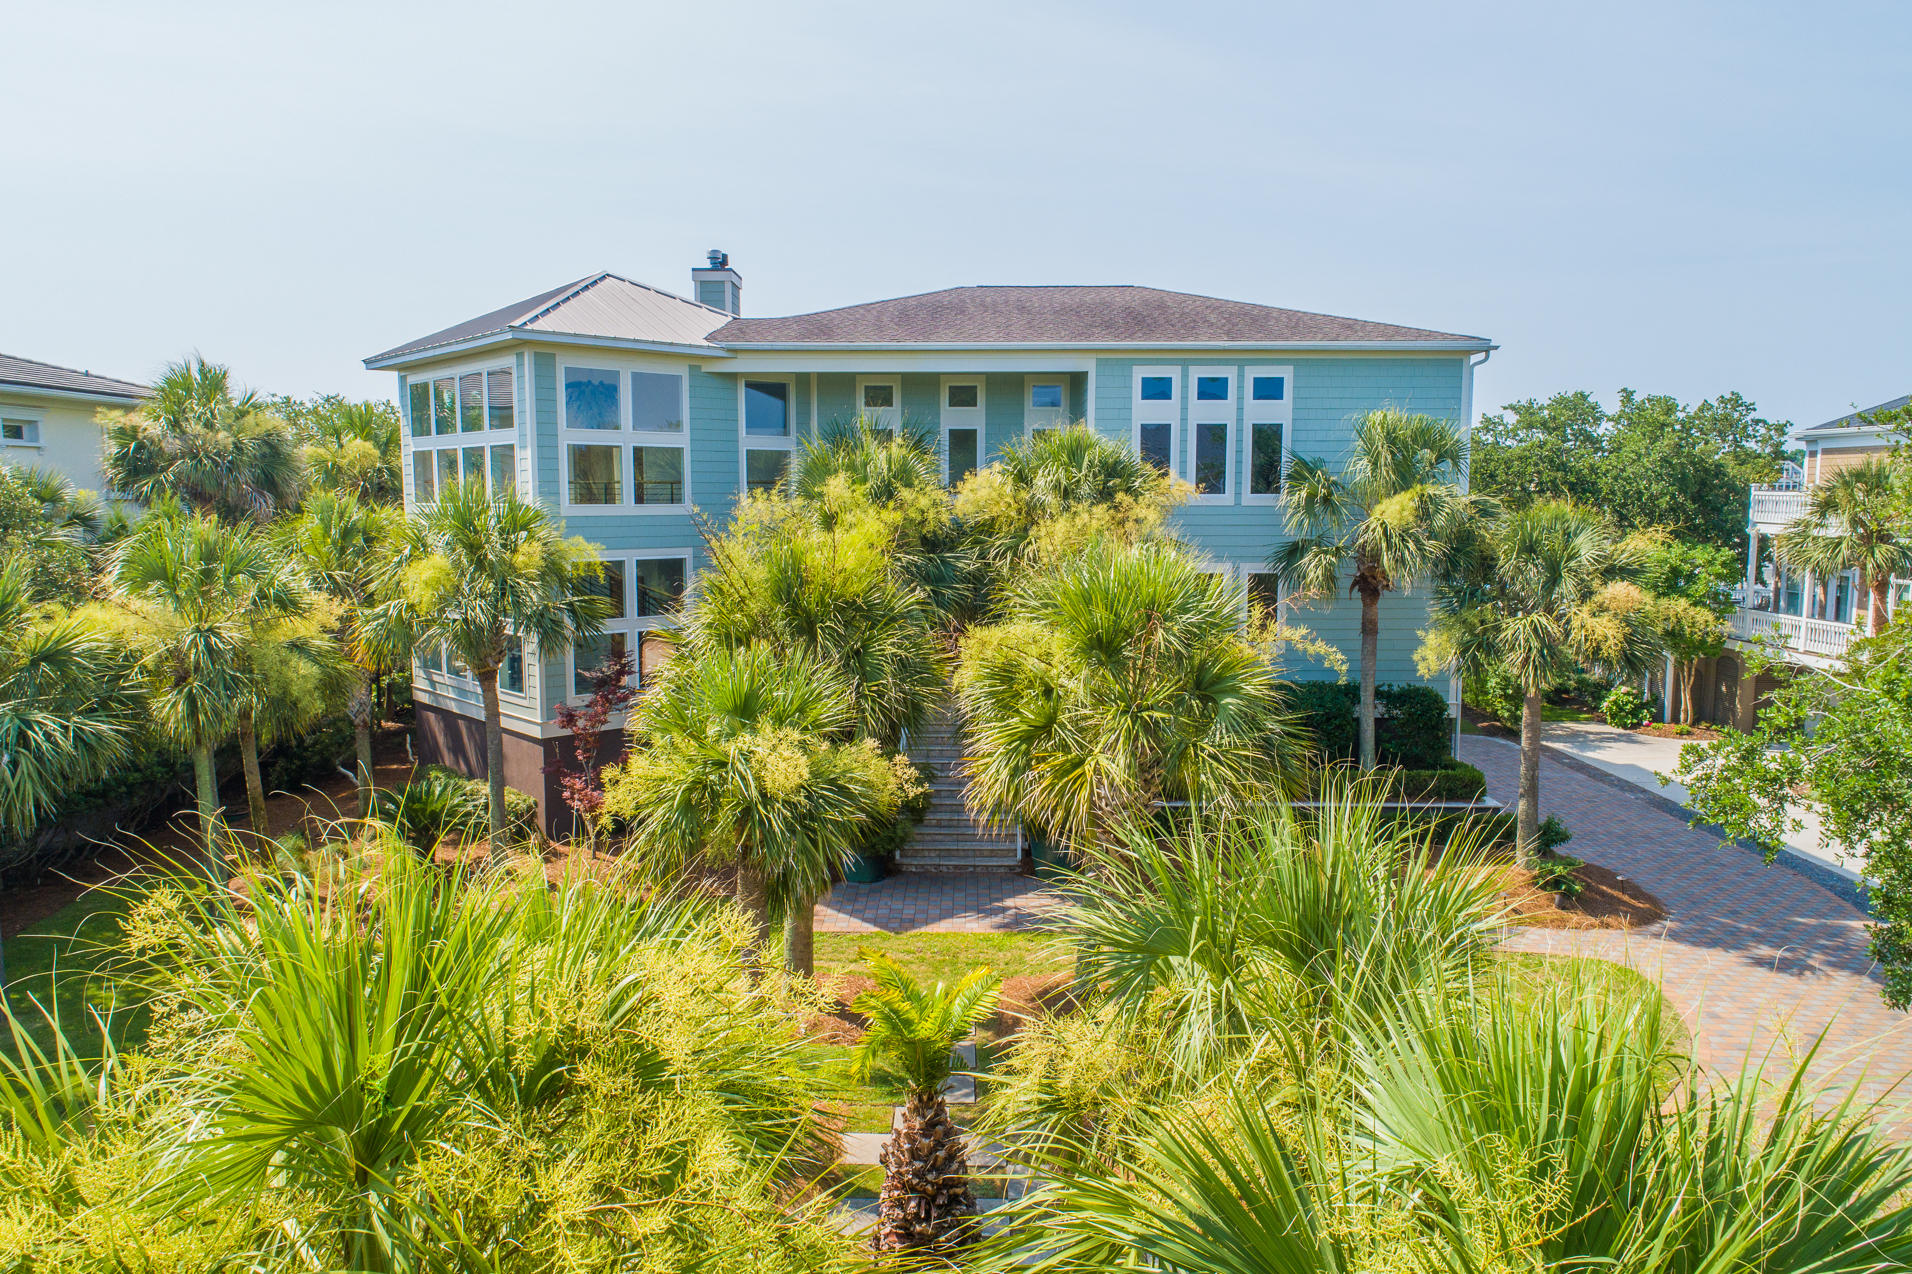 Wild Dunes Homes For Sale - 39 Waterway Island, Isle of Palms, SC - 56